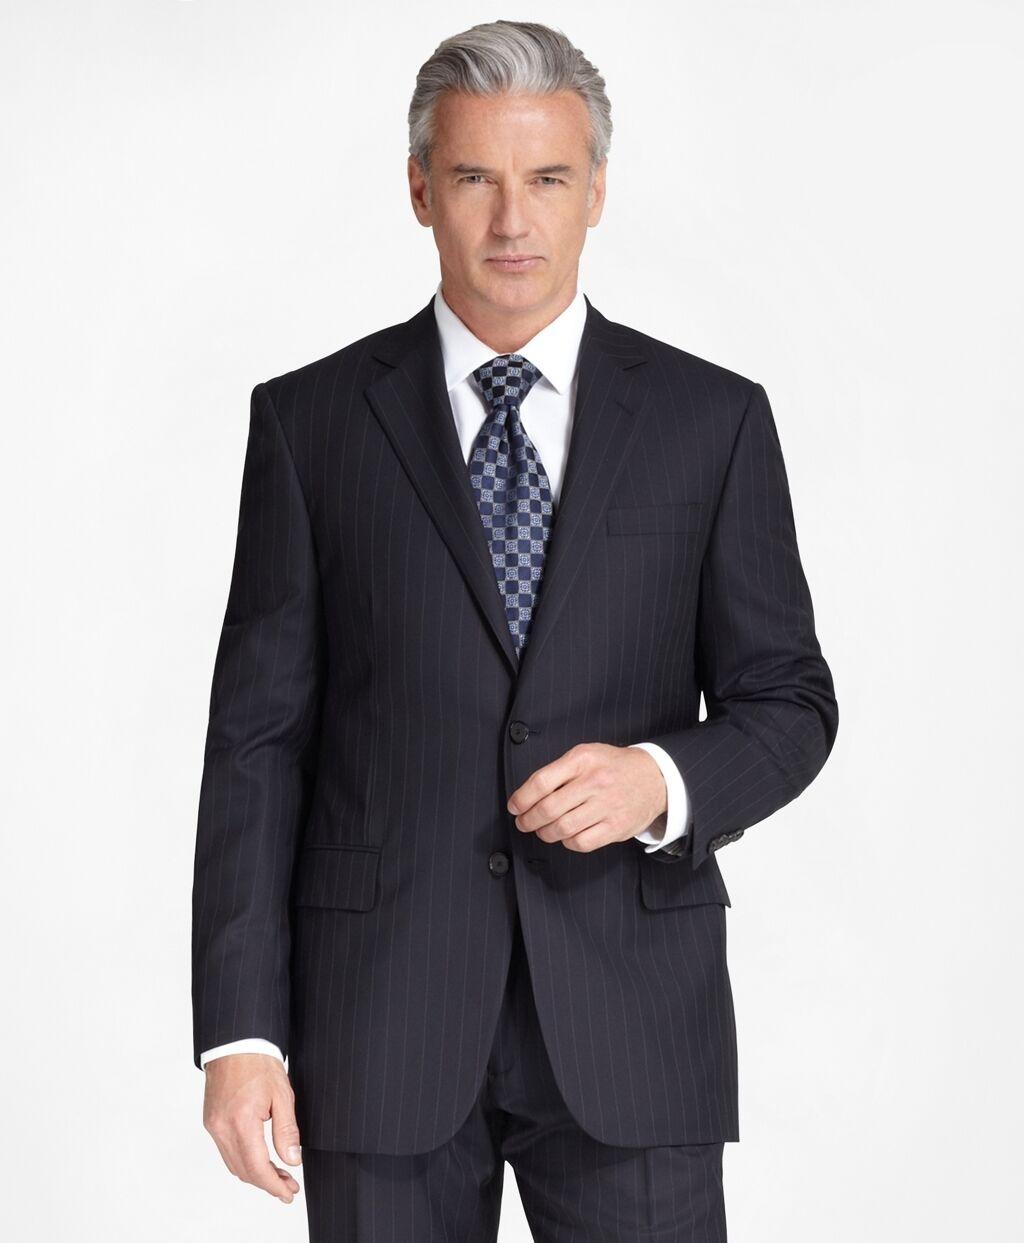 900 Brooks Brothers 1818 Madison Navy blu Striped 42 42 42 R Suit pants 32 X 29 9ac0d5